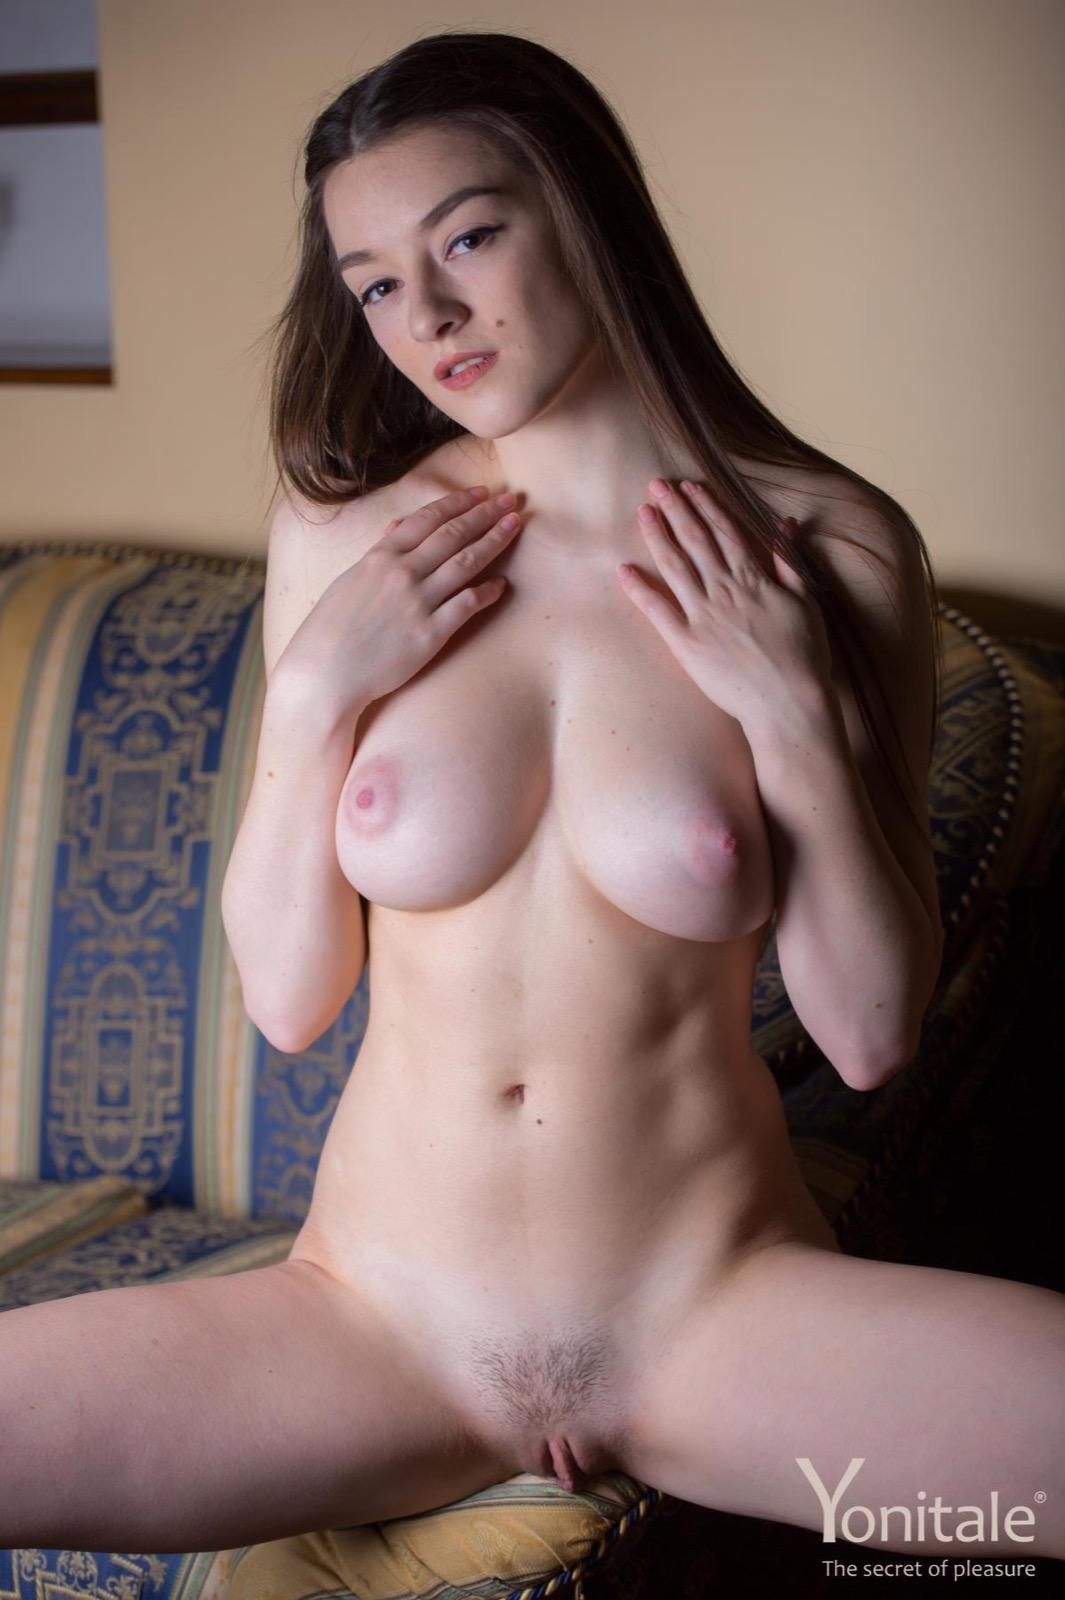 Monica leigh nude pics